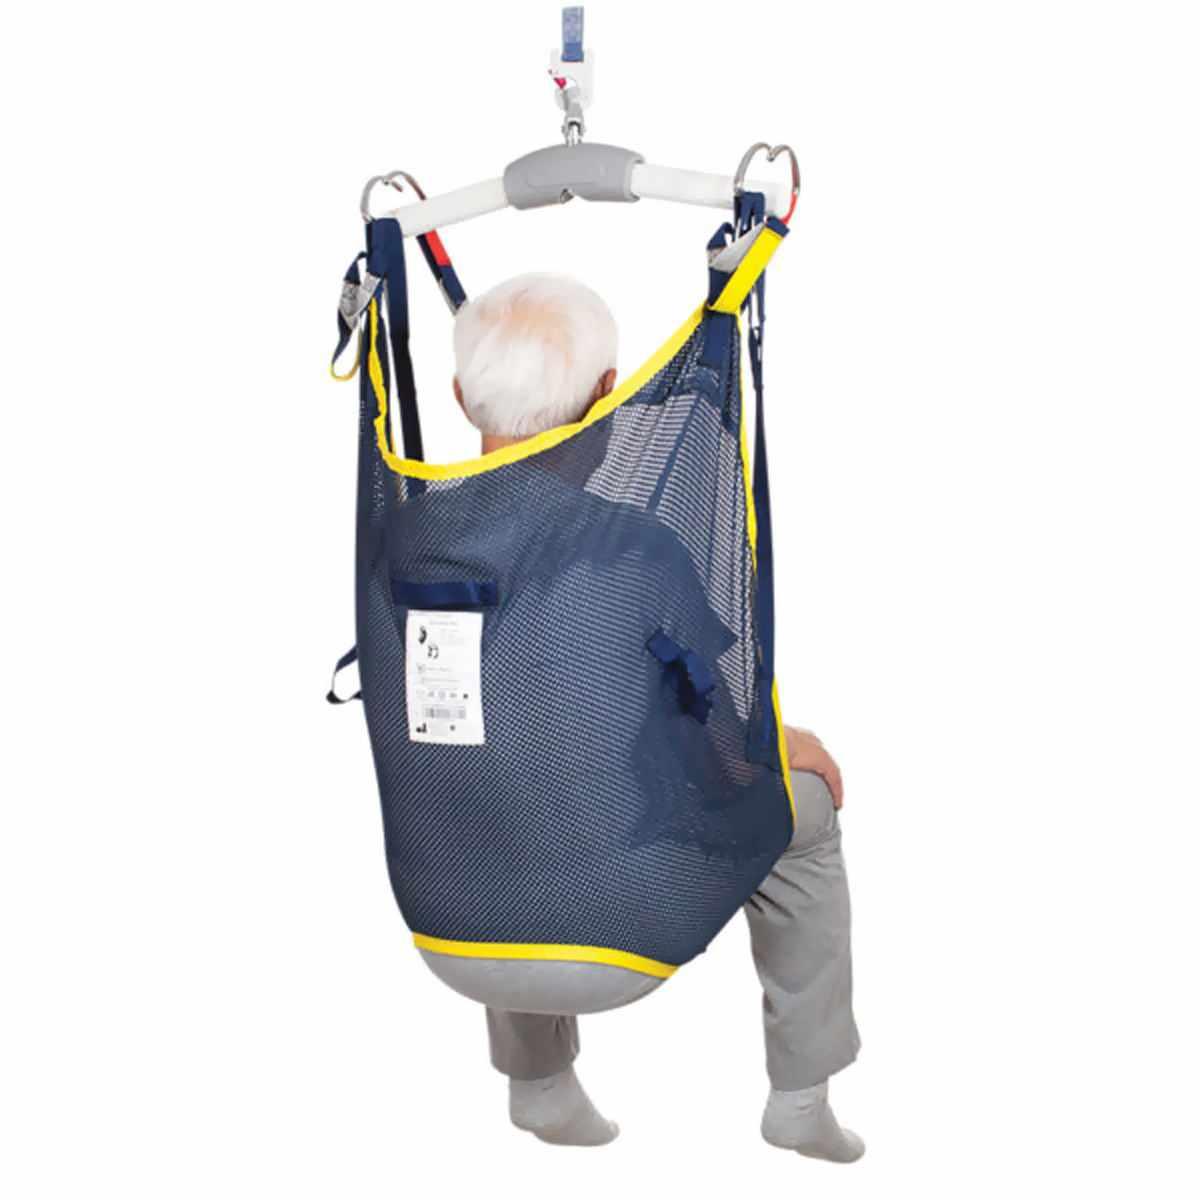 Prism Medical Universal Mesh/Poly Sling - Back